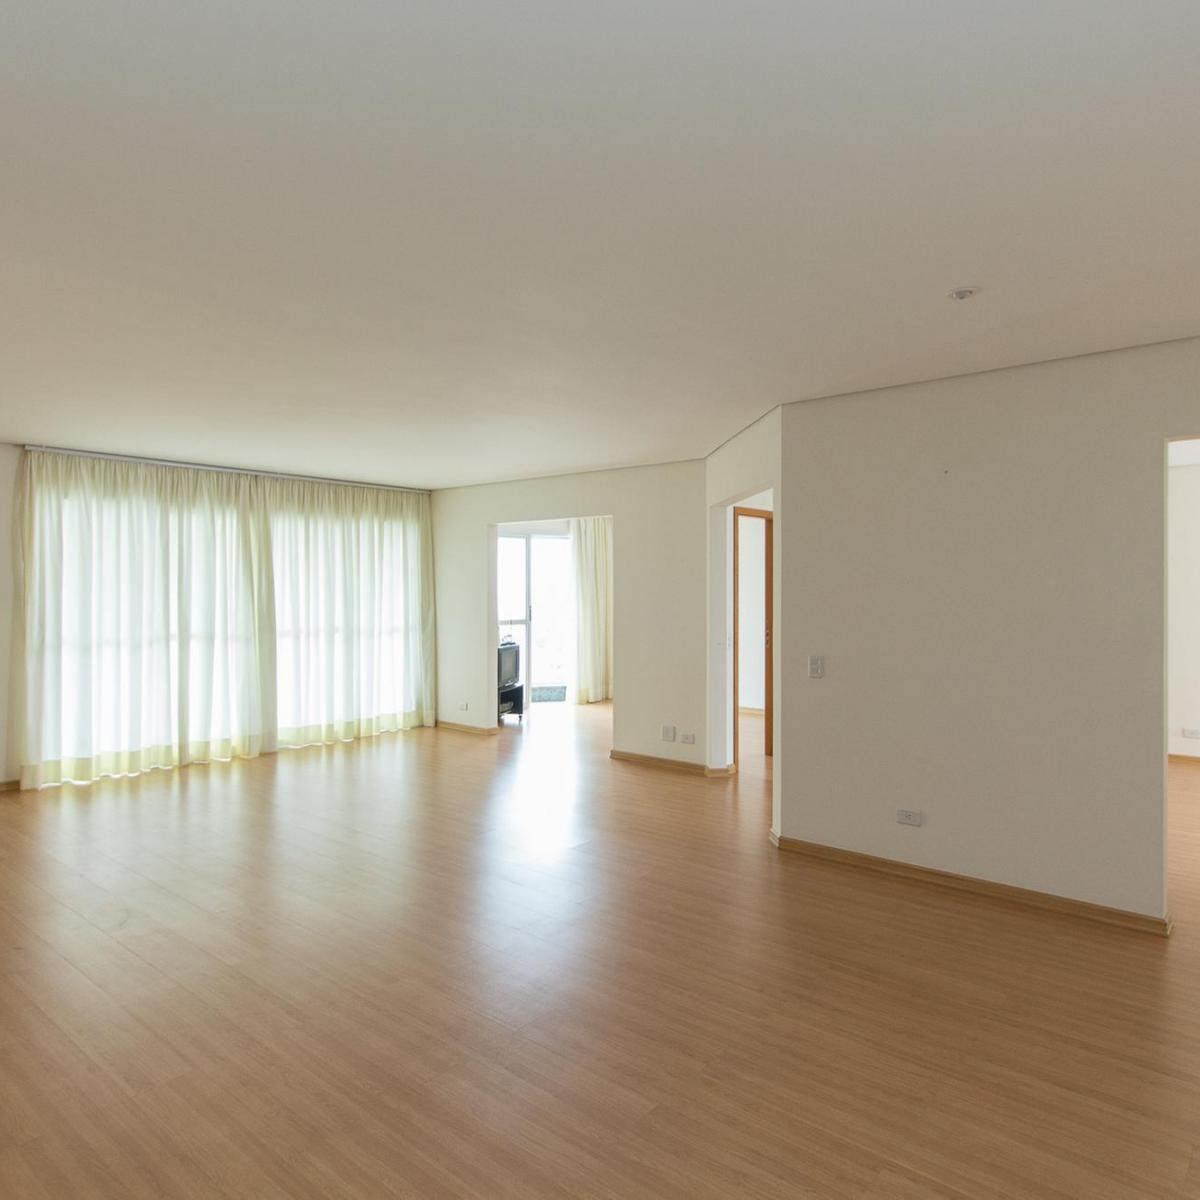 http://www.infocenterhost2.com.br/crm/fotosimovel/170766/25888839-apartamento-curitiba-ecoville.jpg